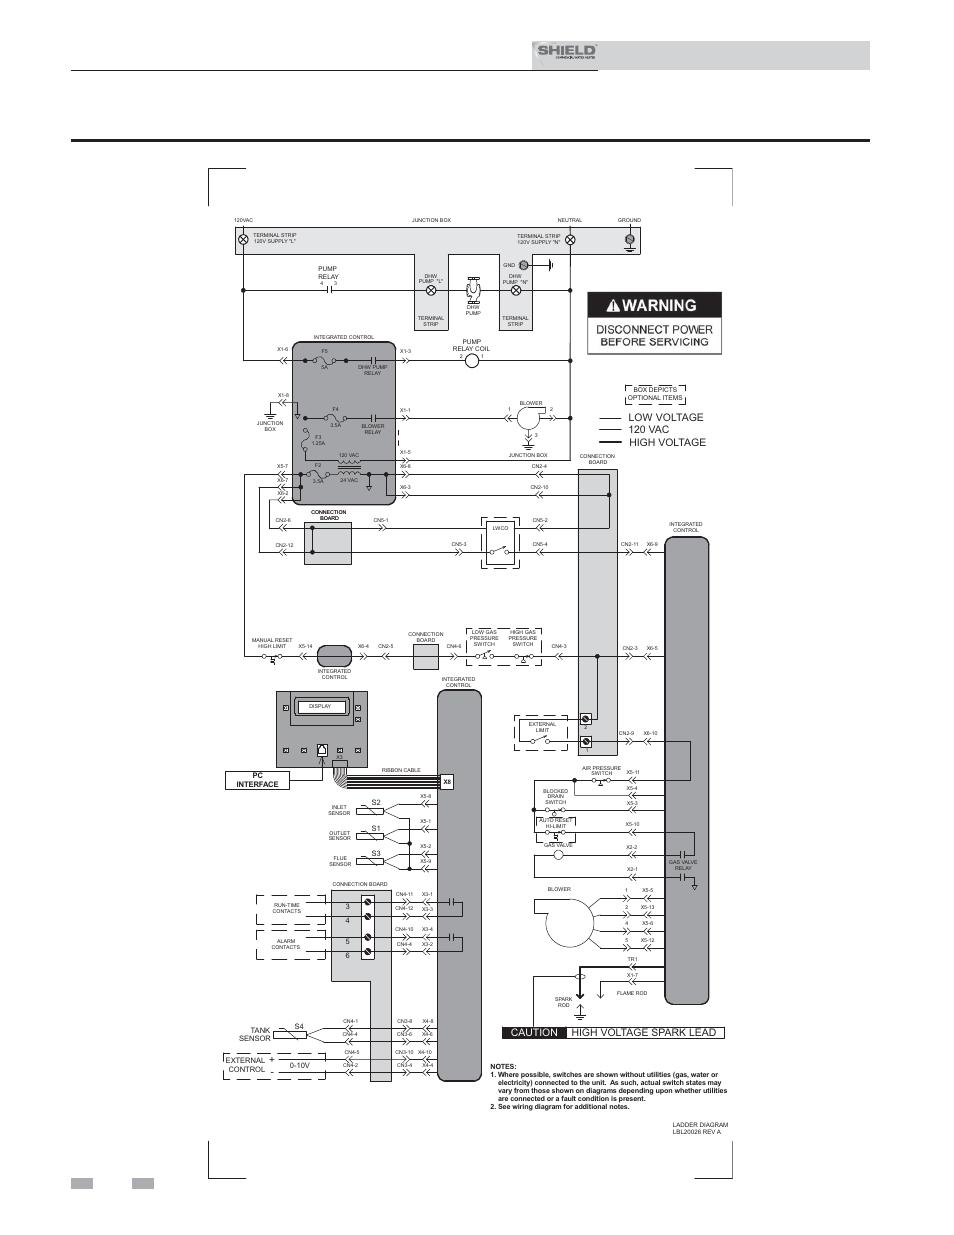 Diagrams  Installation  U0026 Service Manual  Figure 14